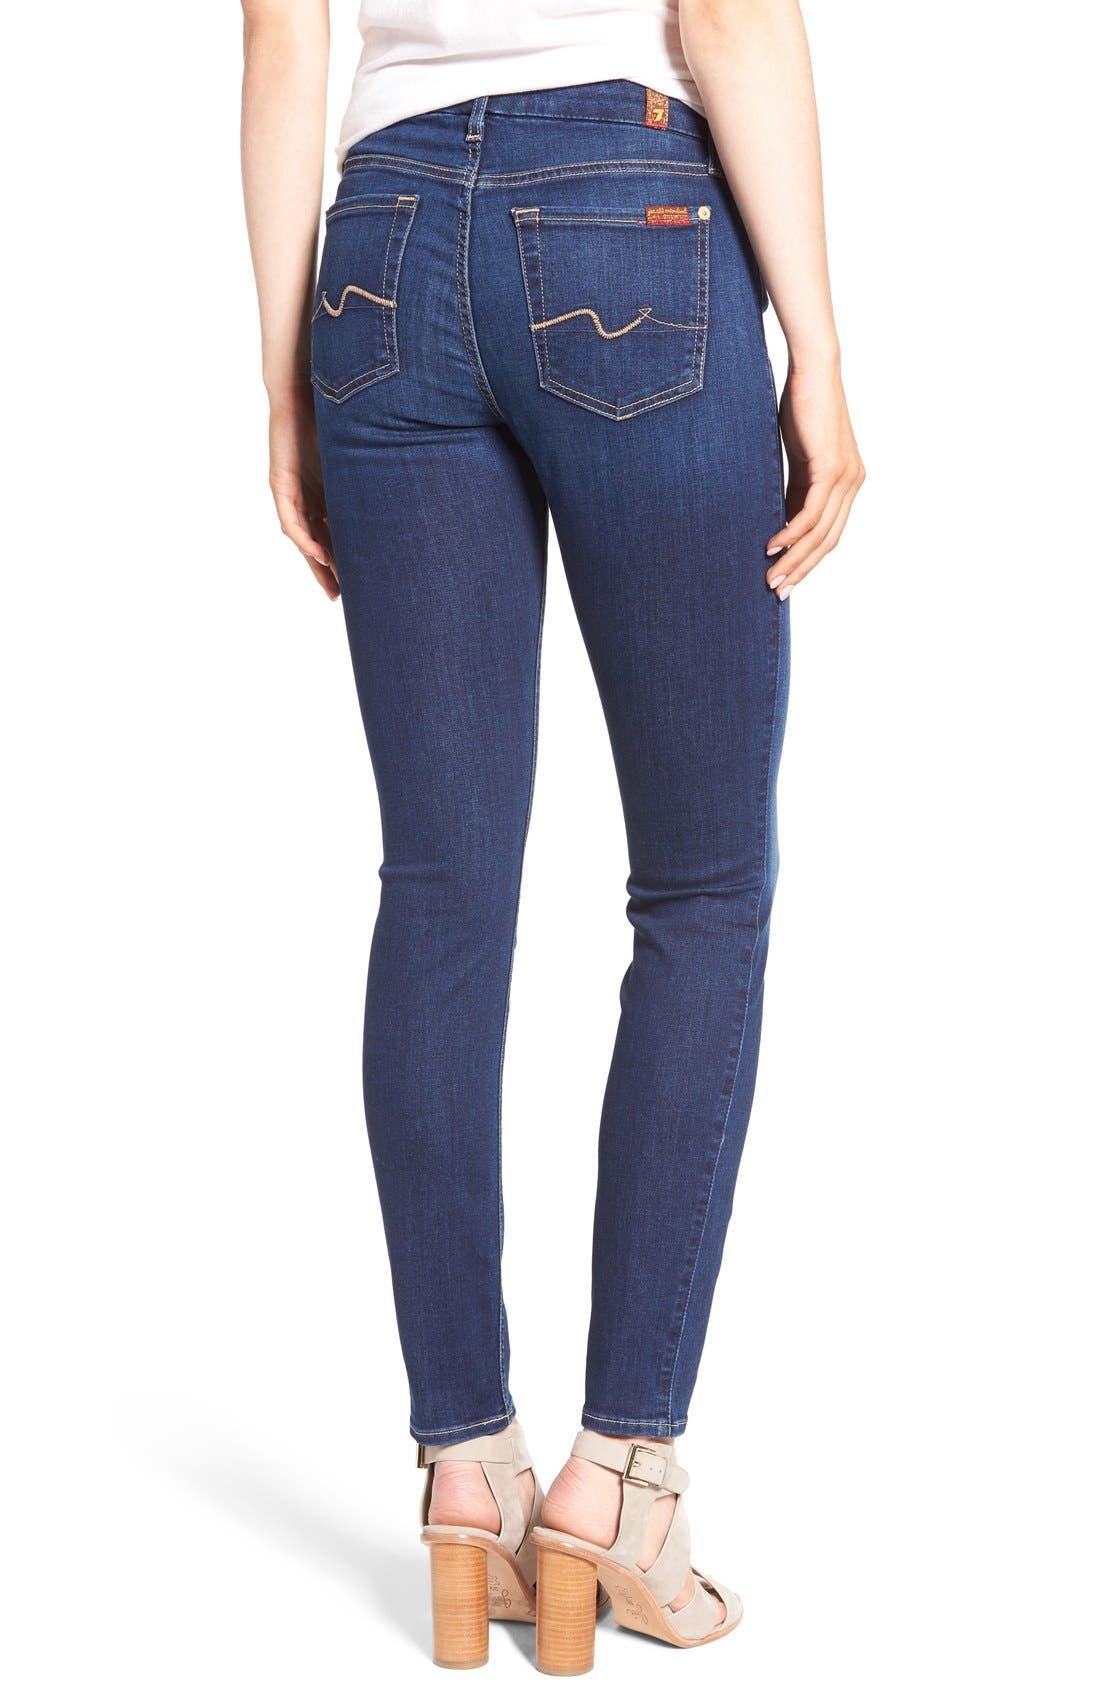 b(air) Skinny Jeans,                             Alternate thumbnail 3, color,                             400